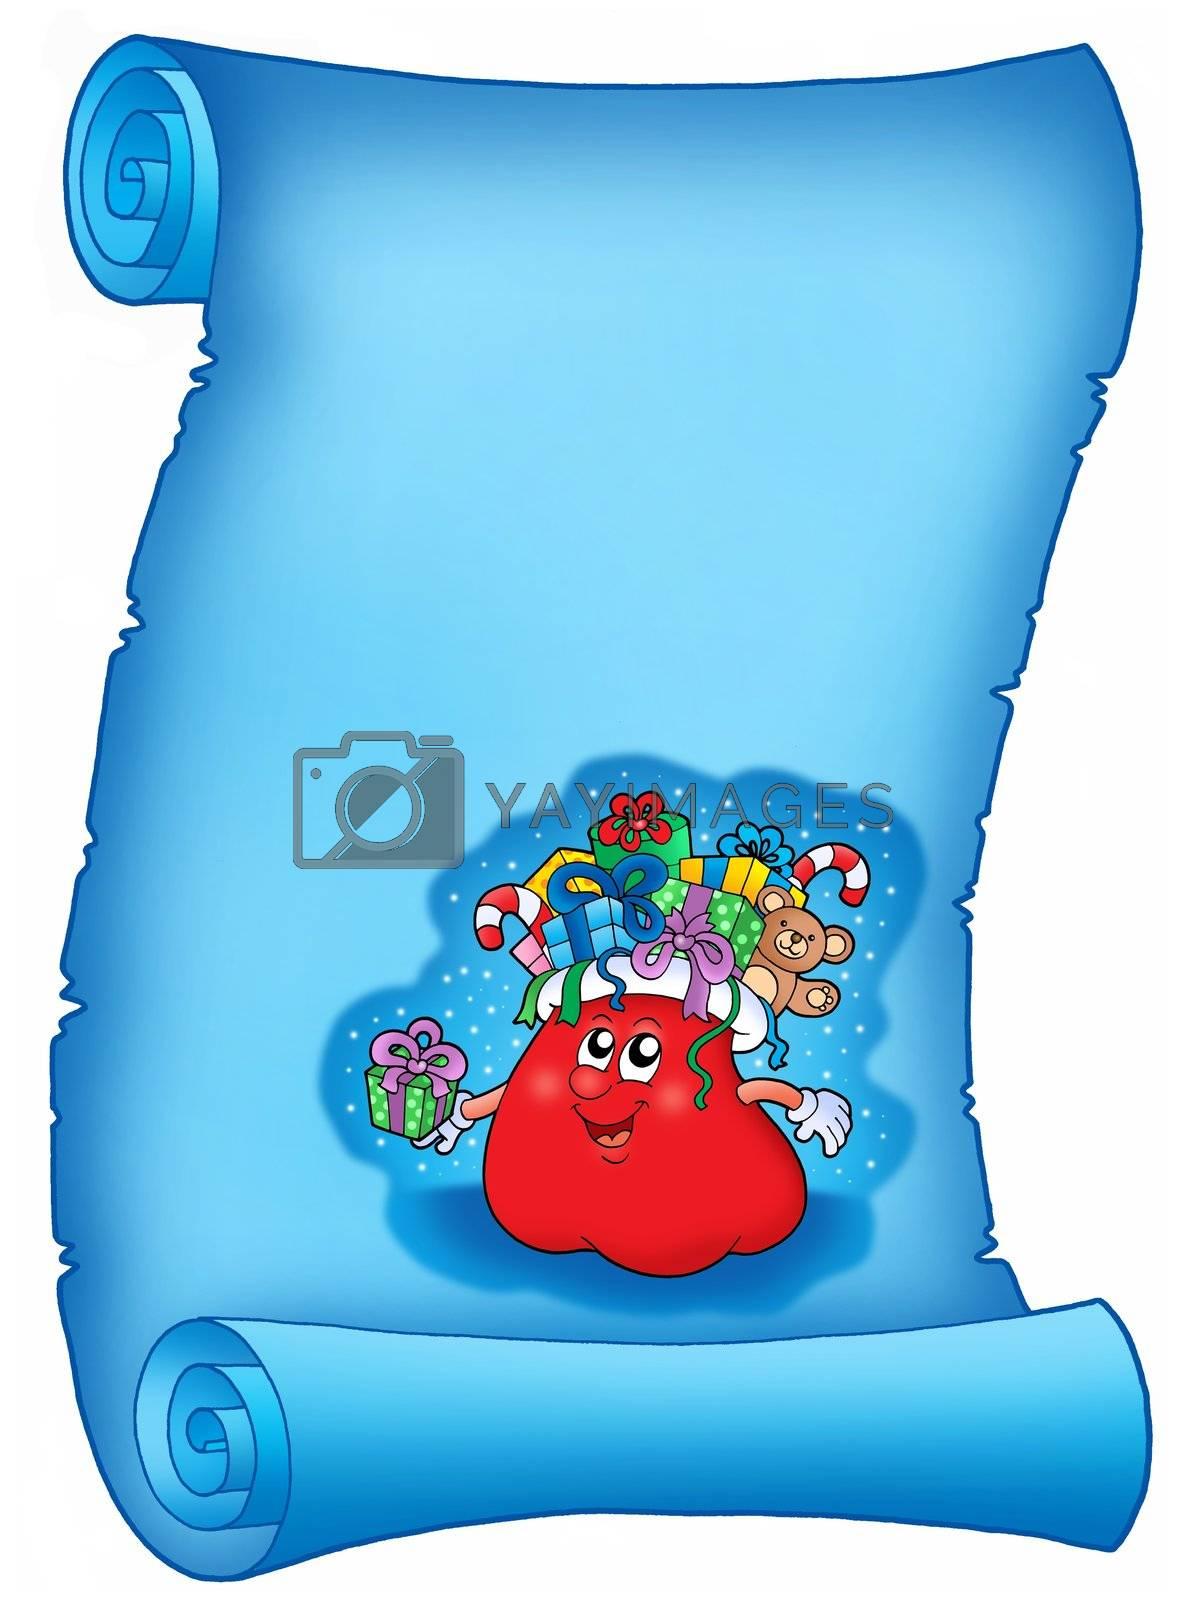 Blue parchment with Santas gift bag - color illustration.